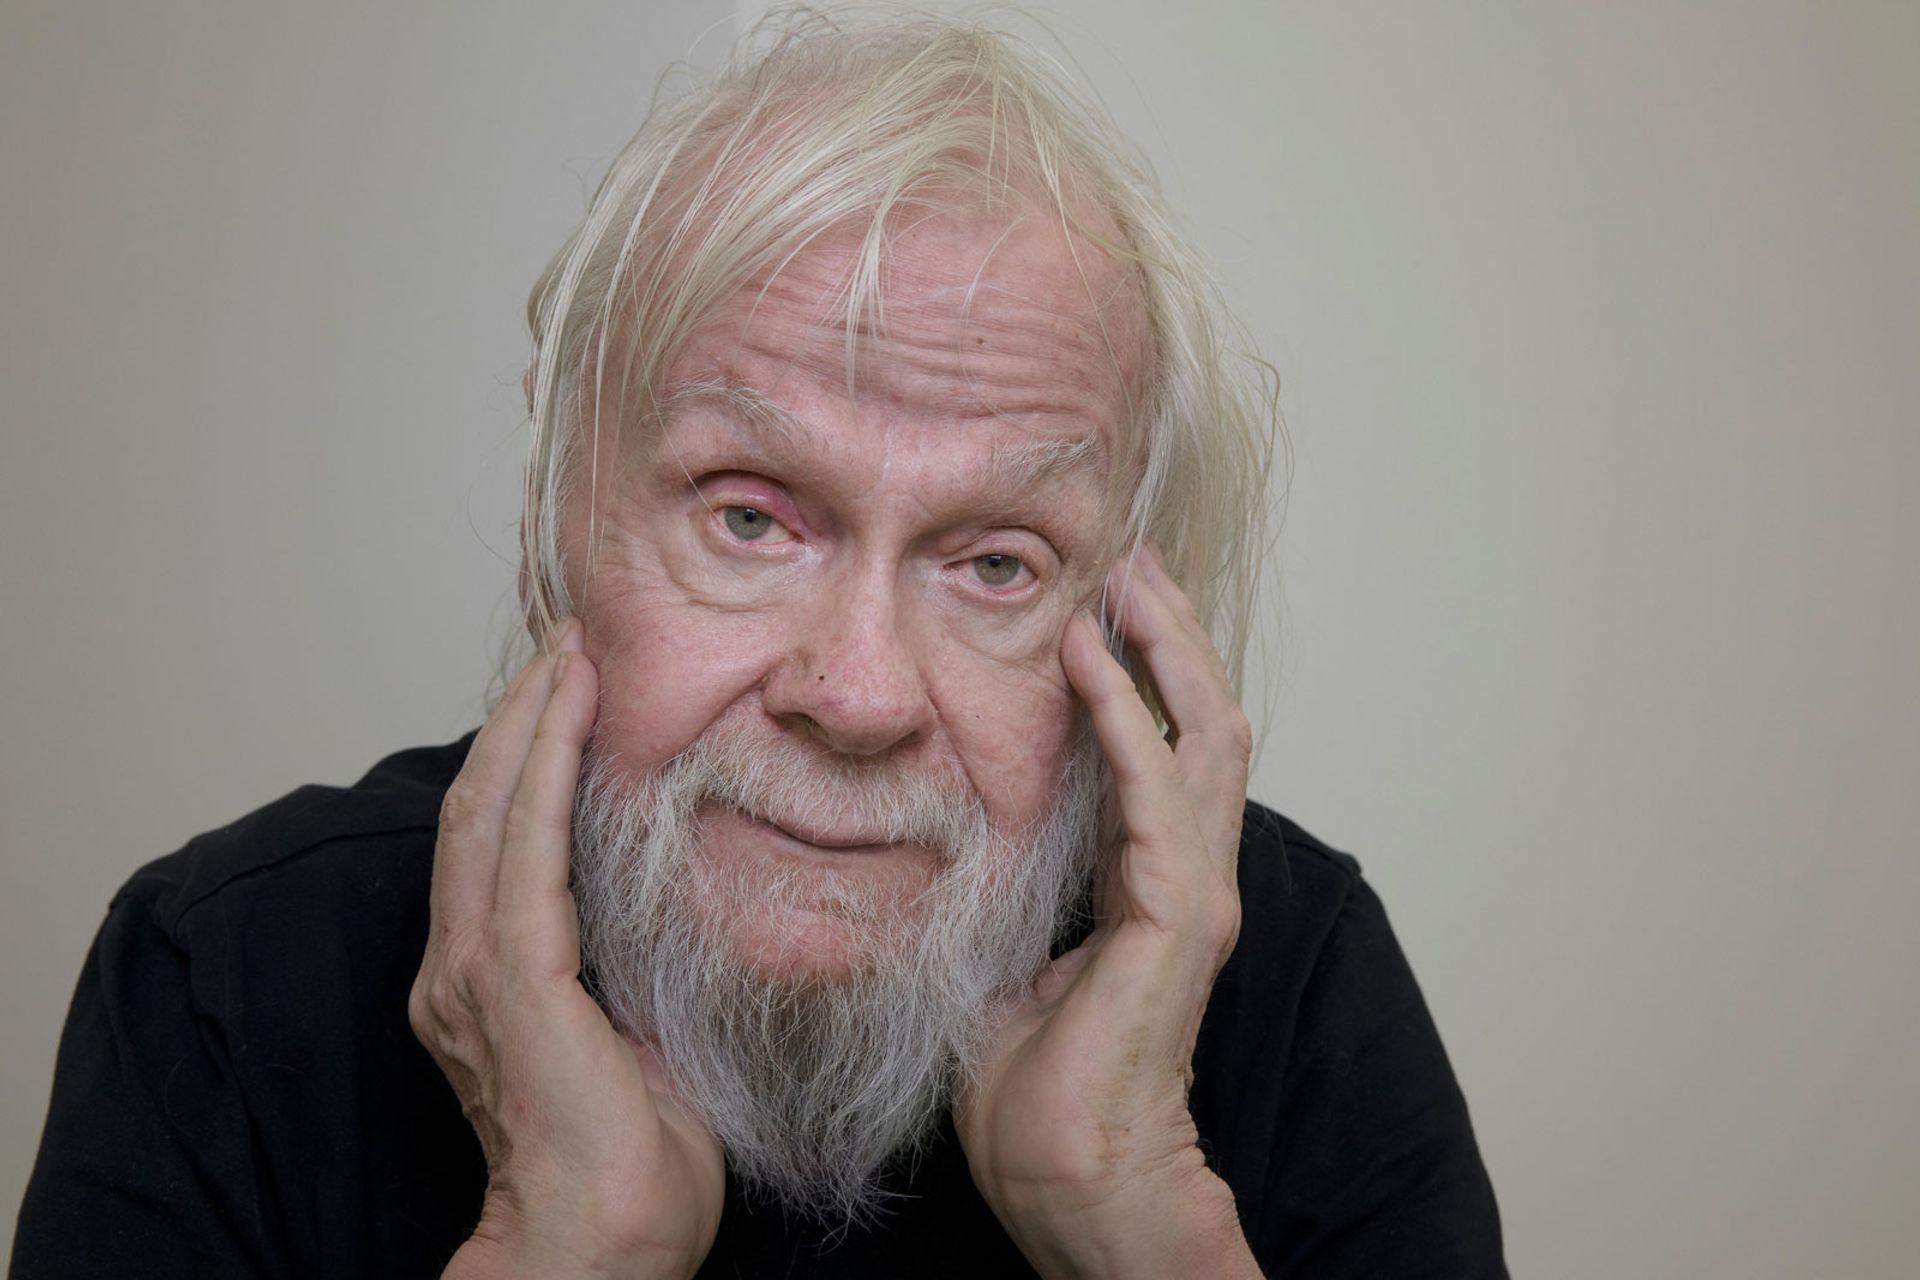 The conceptual artist John Baldessari has died aged 88 © Dan Tuffs / Alamy Stock Photo